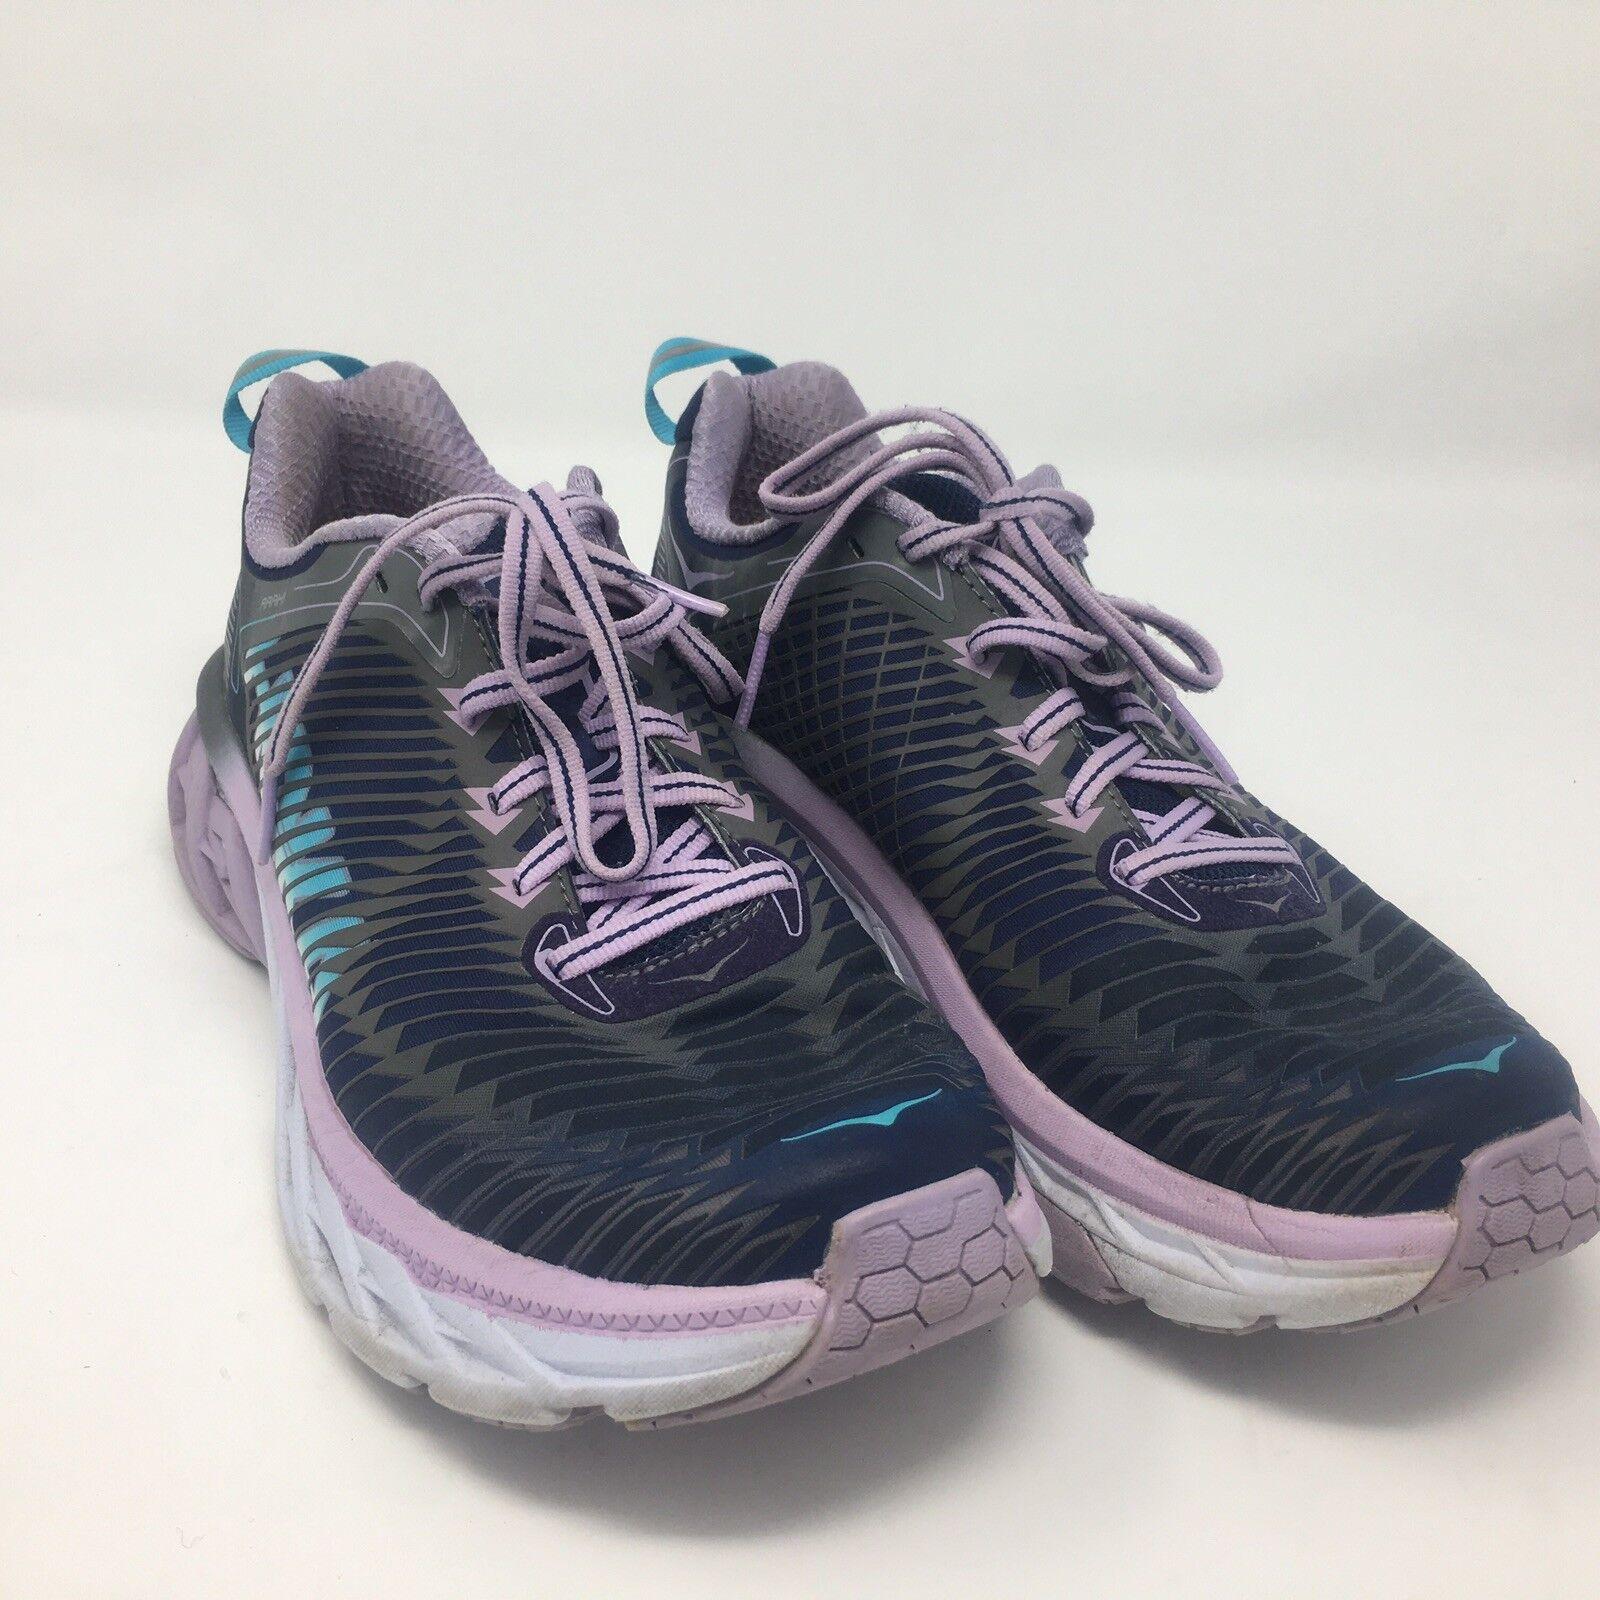 HOKA One 8.5 One Damenschuhe Schuhes Größe 8.5 One Purple Blau Weiß Running Arahi 763df3